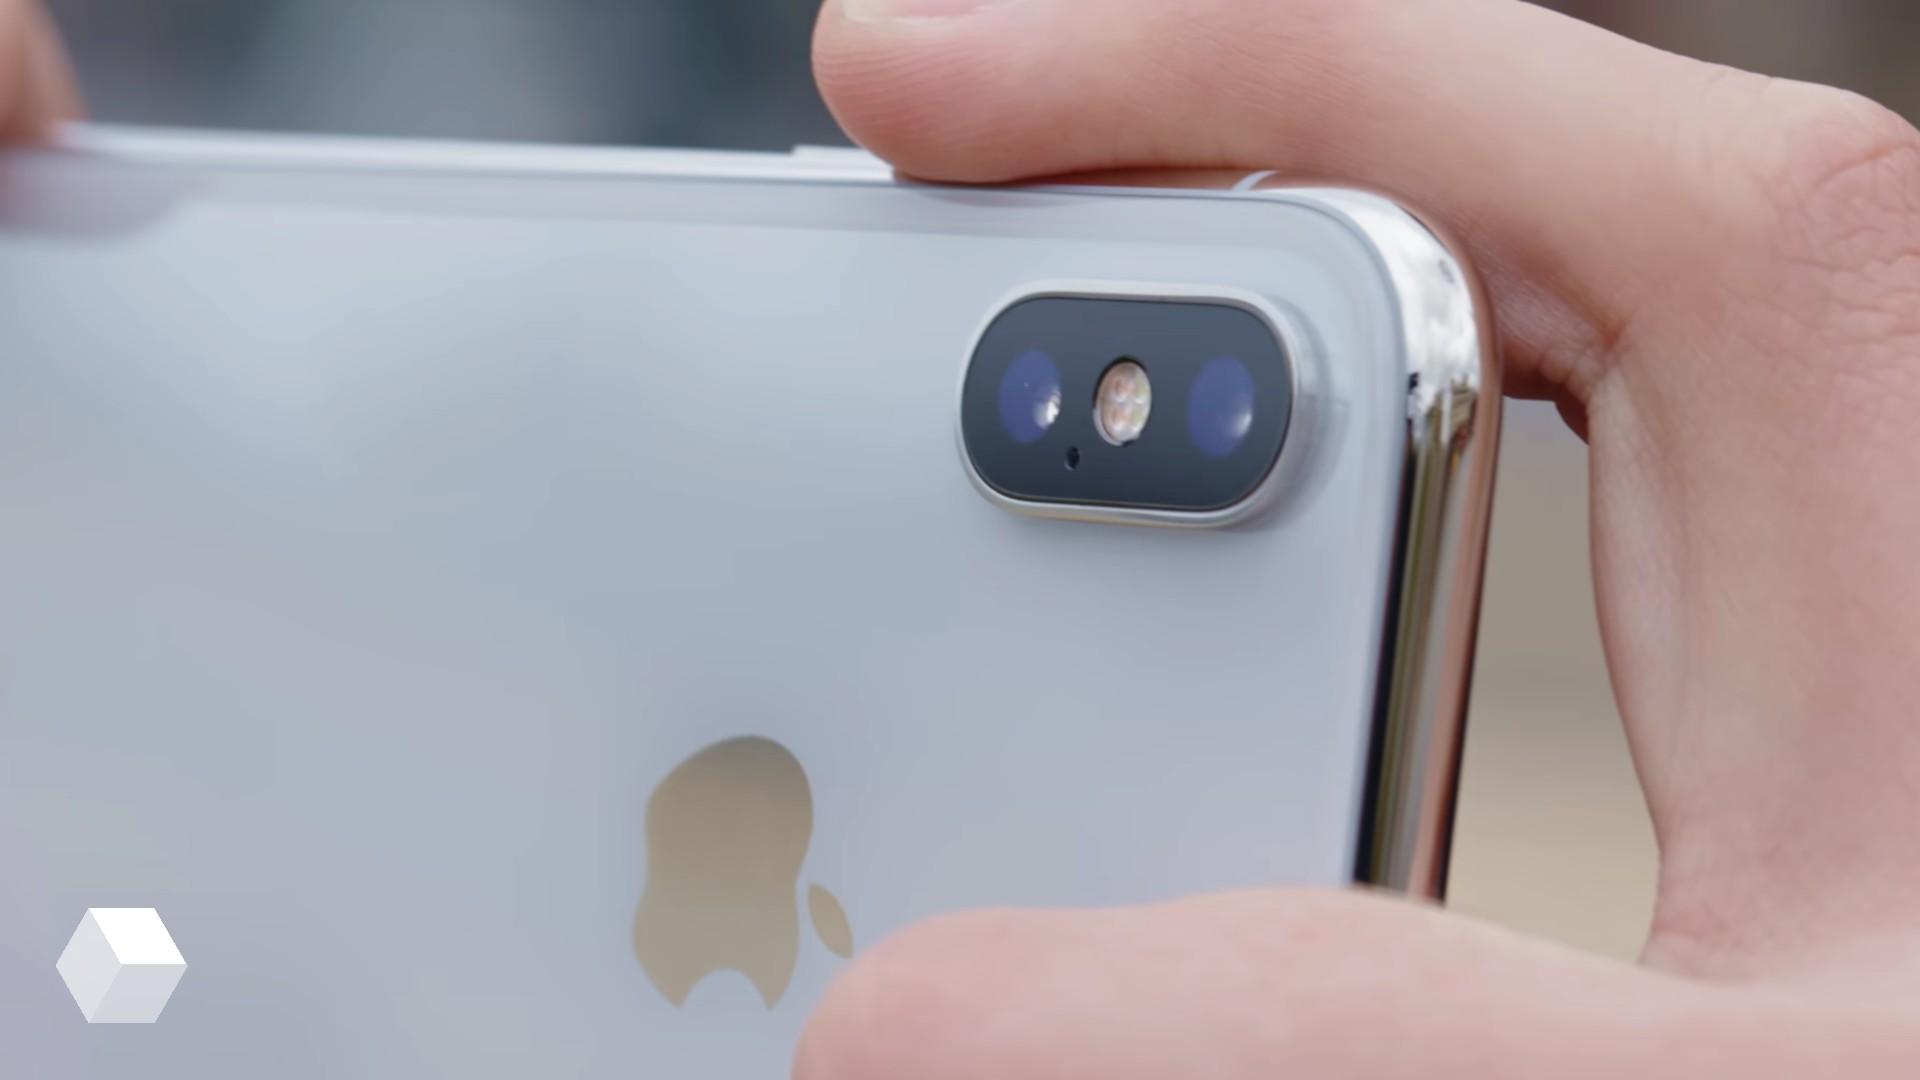 iPhone XC, XS и XS Plus — названия новых смартфонов Apple